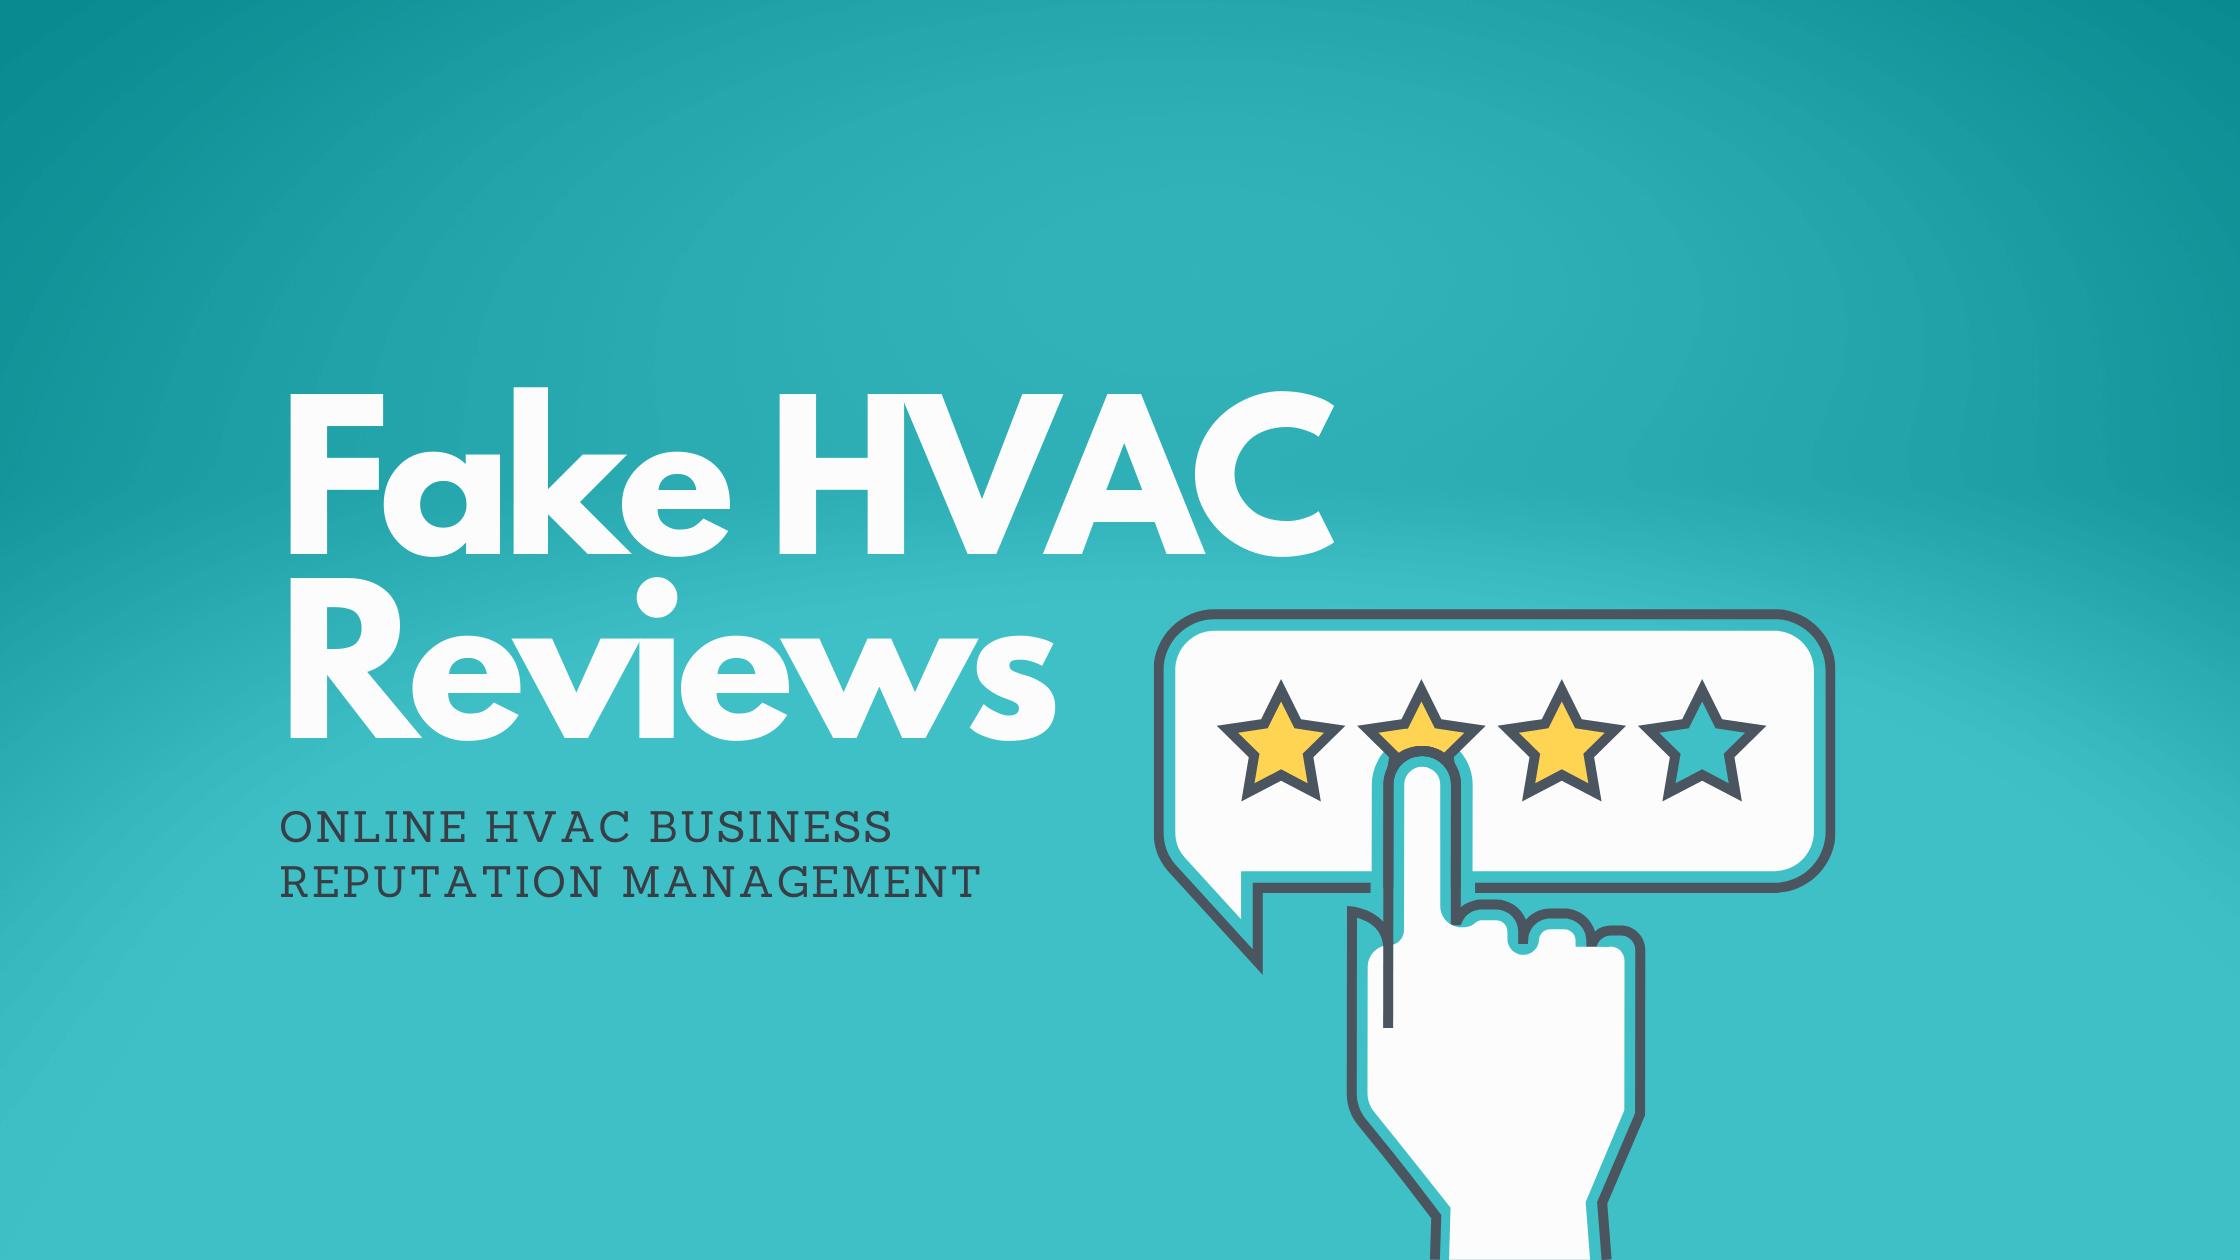 How Google and Yelp handle fake HVAC reviews